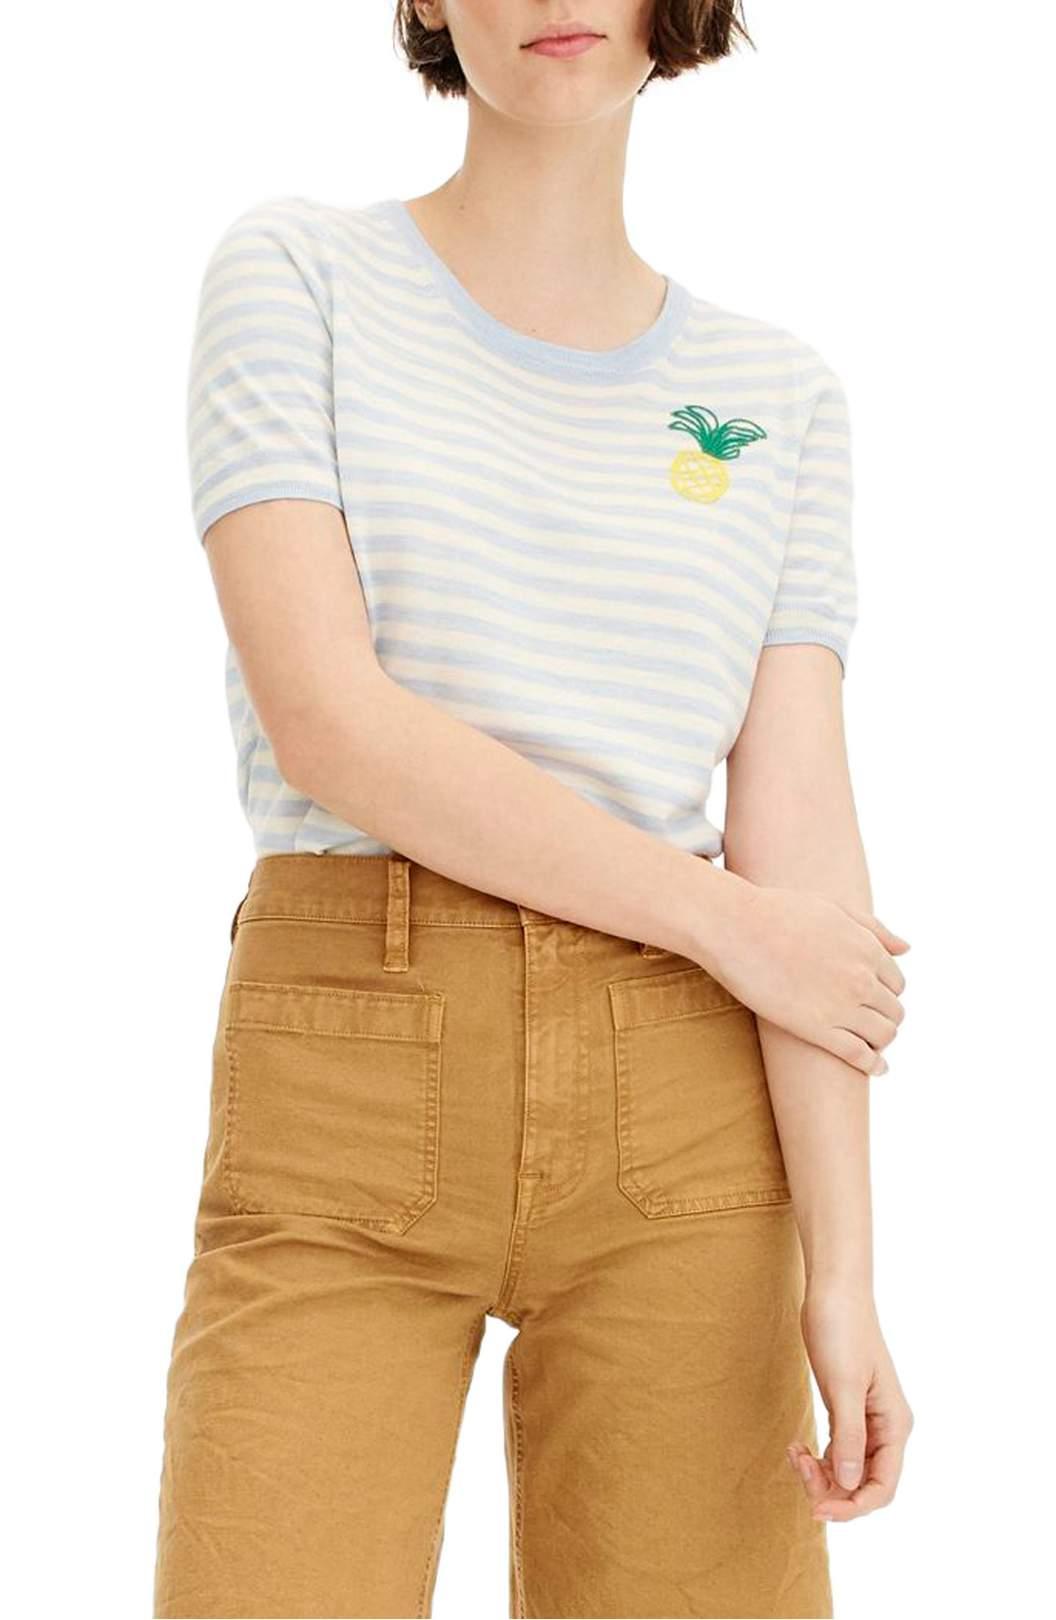 https://shop.nordstrom.com/s/j-crew-tippi-pineapple-stripe-short-sleeve-sweater/4965779?origin=keywordsearch-personalizedsort&fashioncolor=HEATHER%20BREEZE%20IVORY